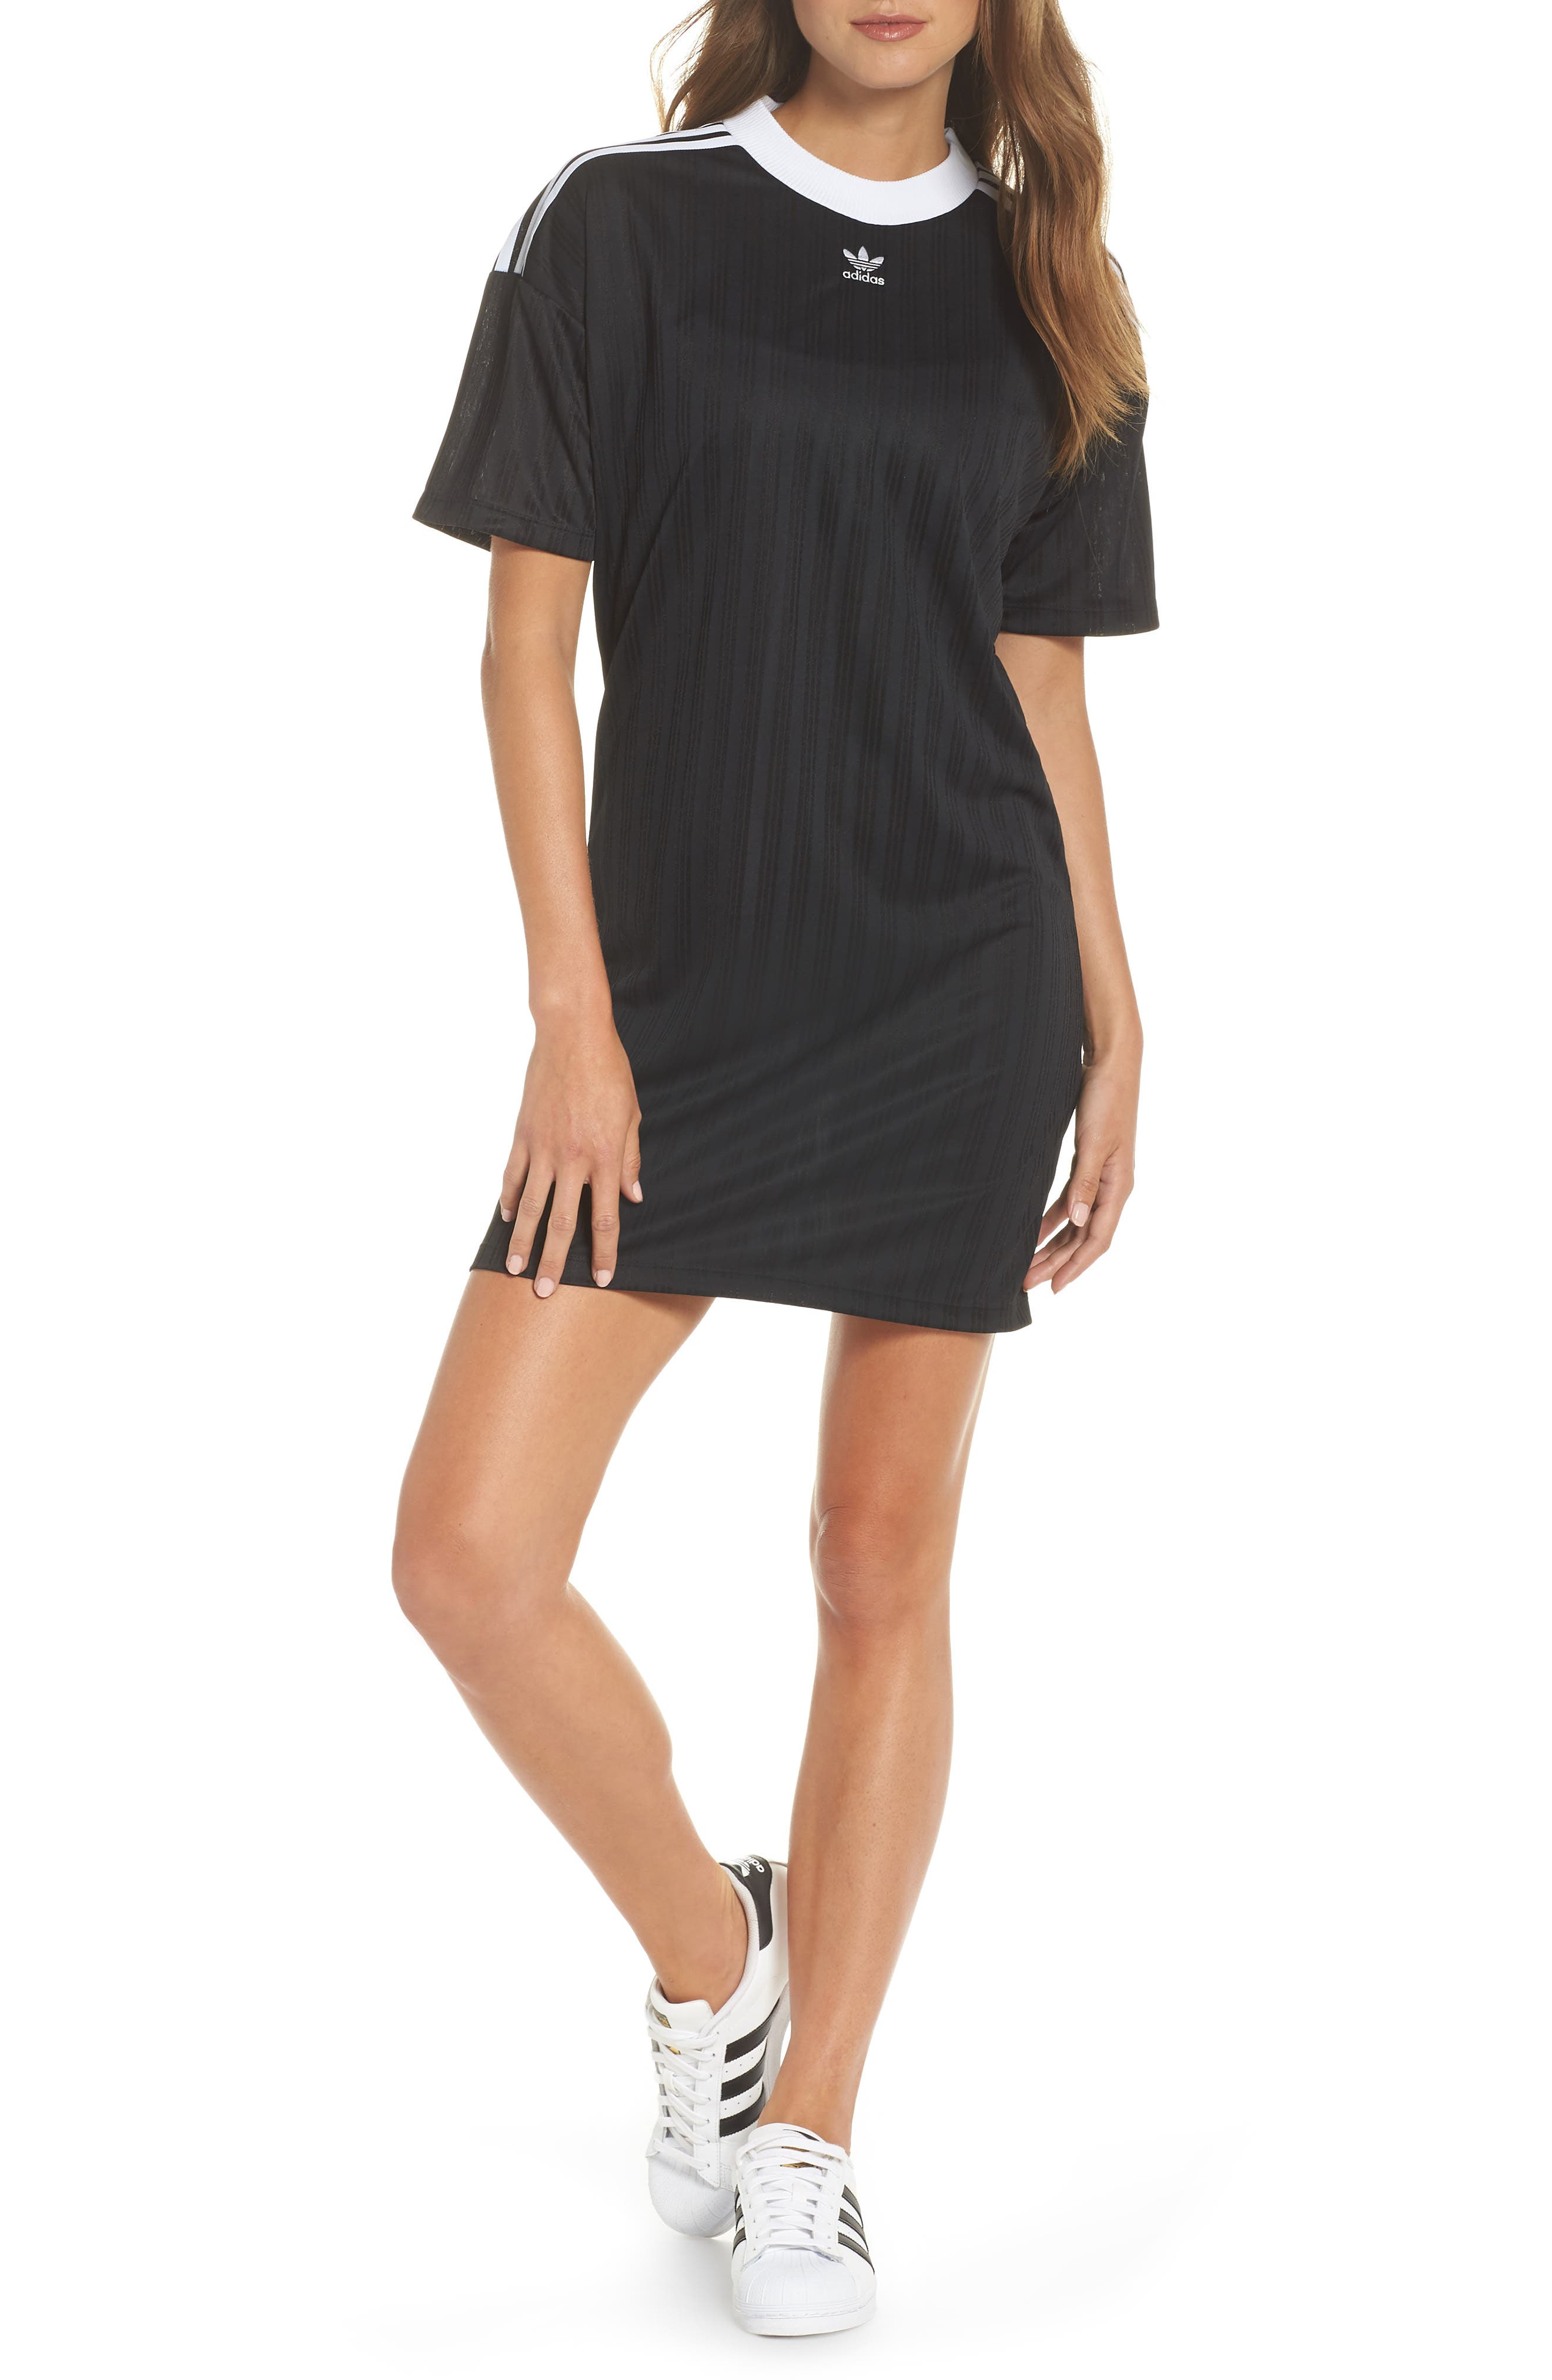 ADIDAS ORIGINALS,                             Trefoil T-Shirt Dress,                             Main thumbnail 1, color,                             001